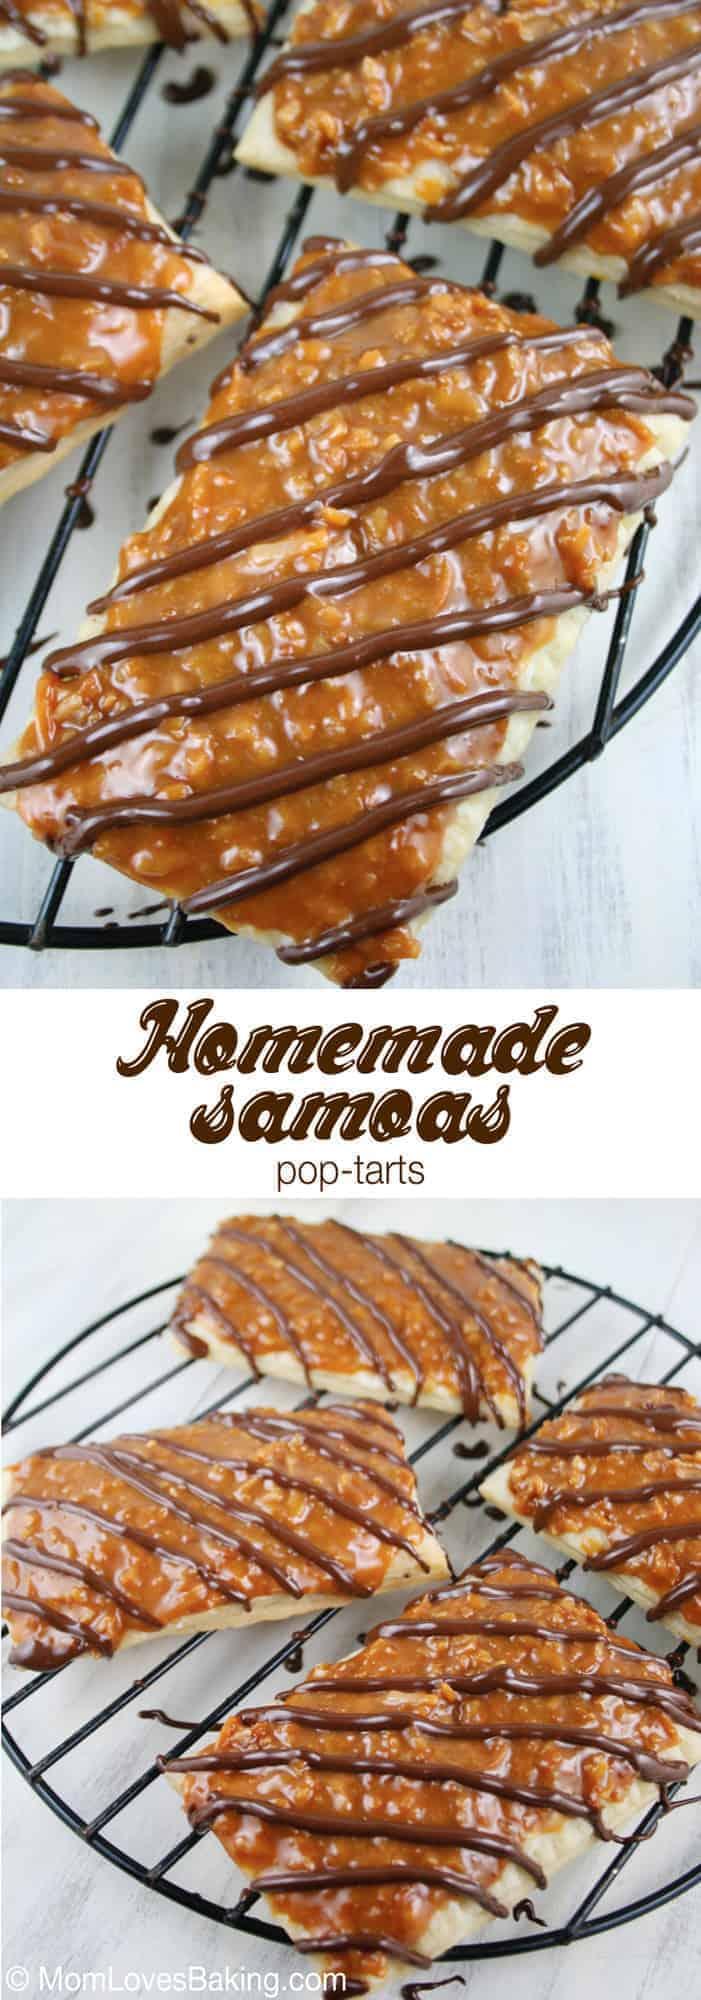 Homemade Samoas Poptarts